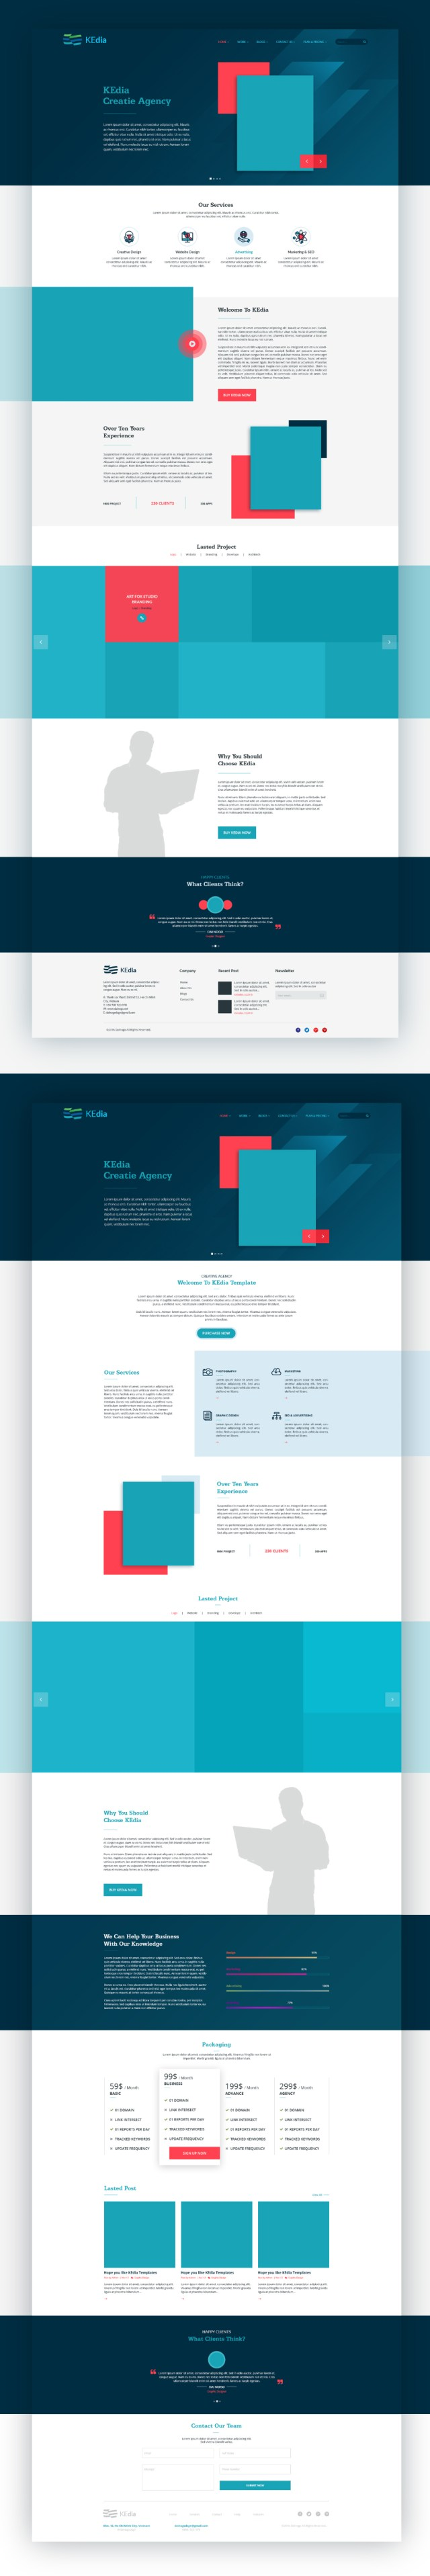 Kedia Website Free PSD Template